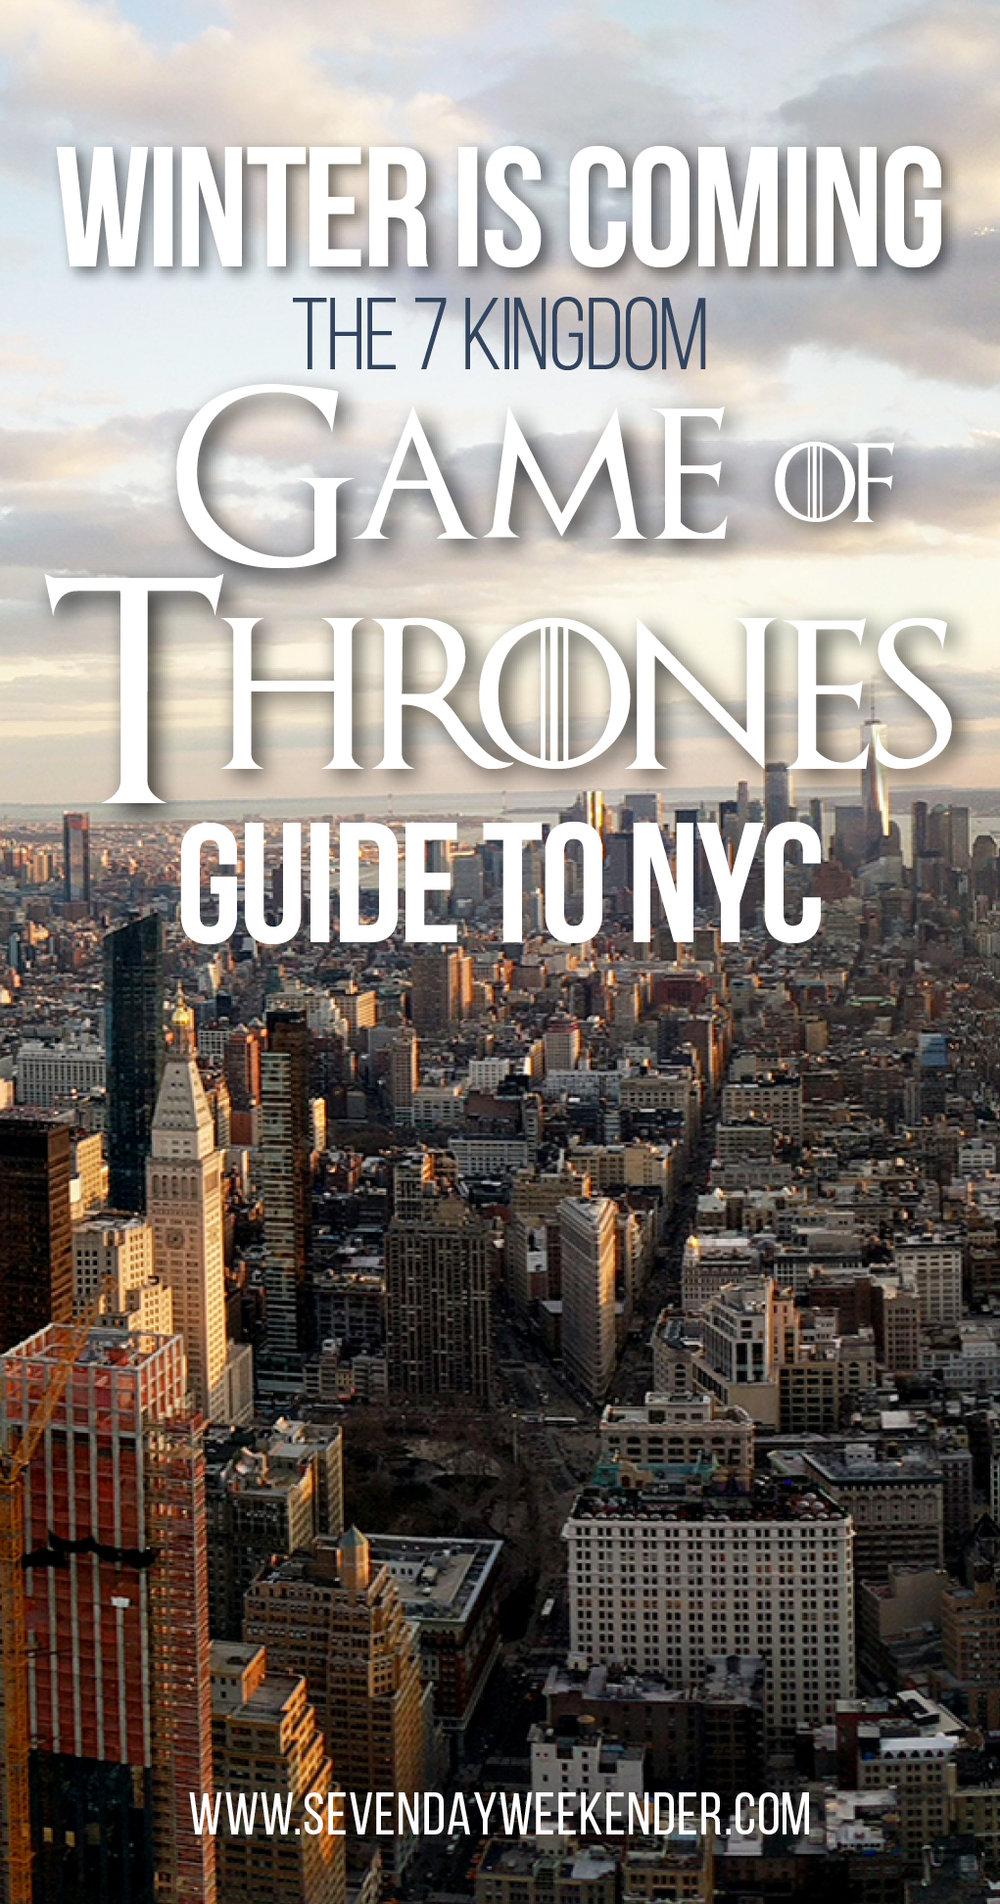 A 7 Kingdom GOT Guide to NYC